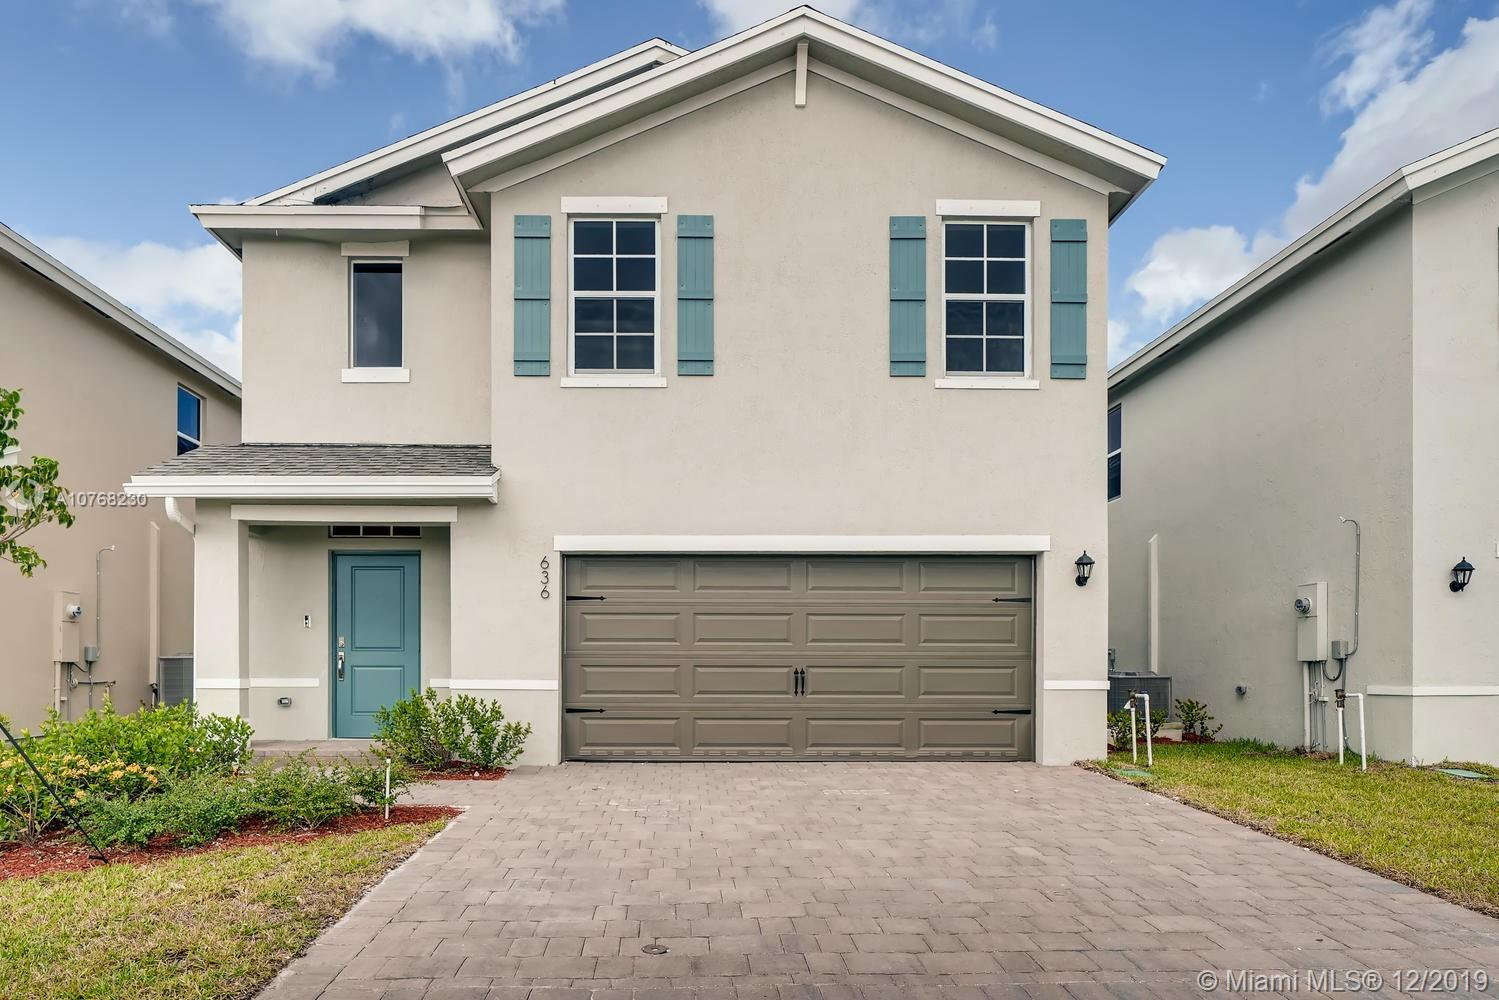 636 NE 5th Way, Florida City, FL 33034 - Florida City, FL real estate listing